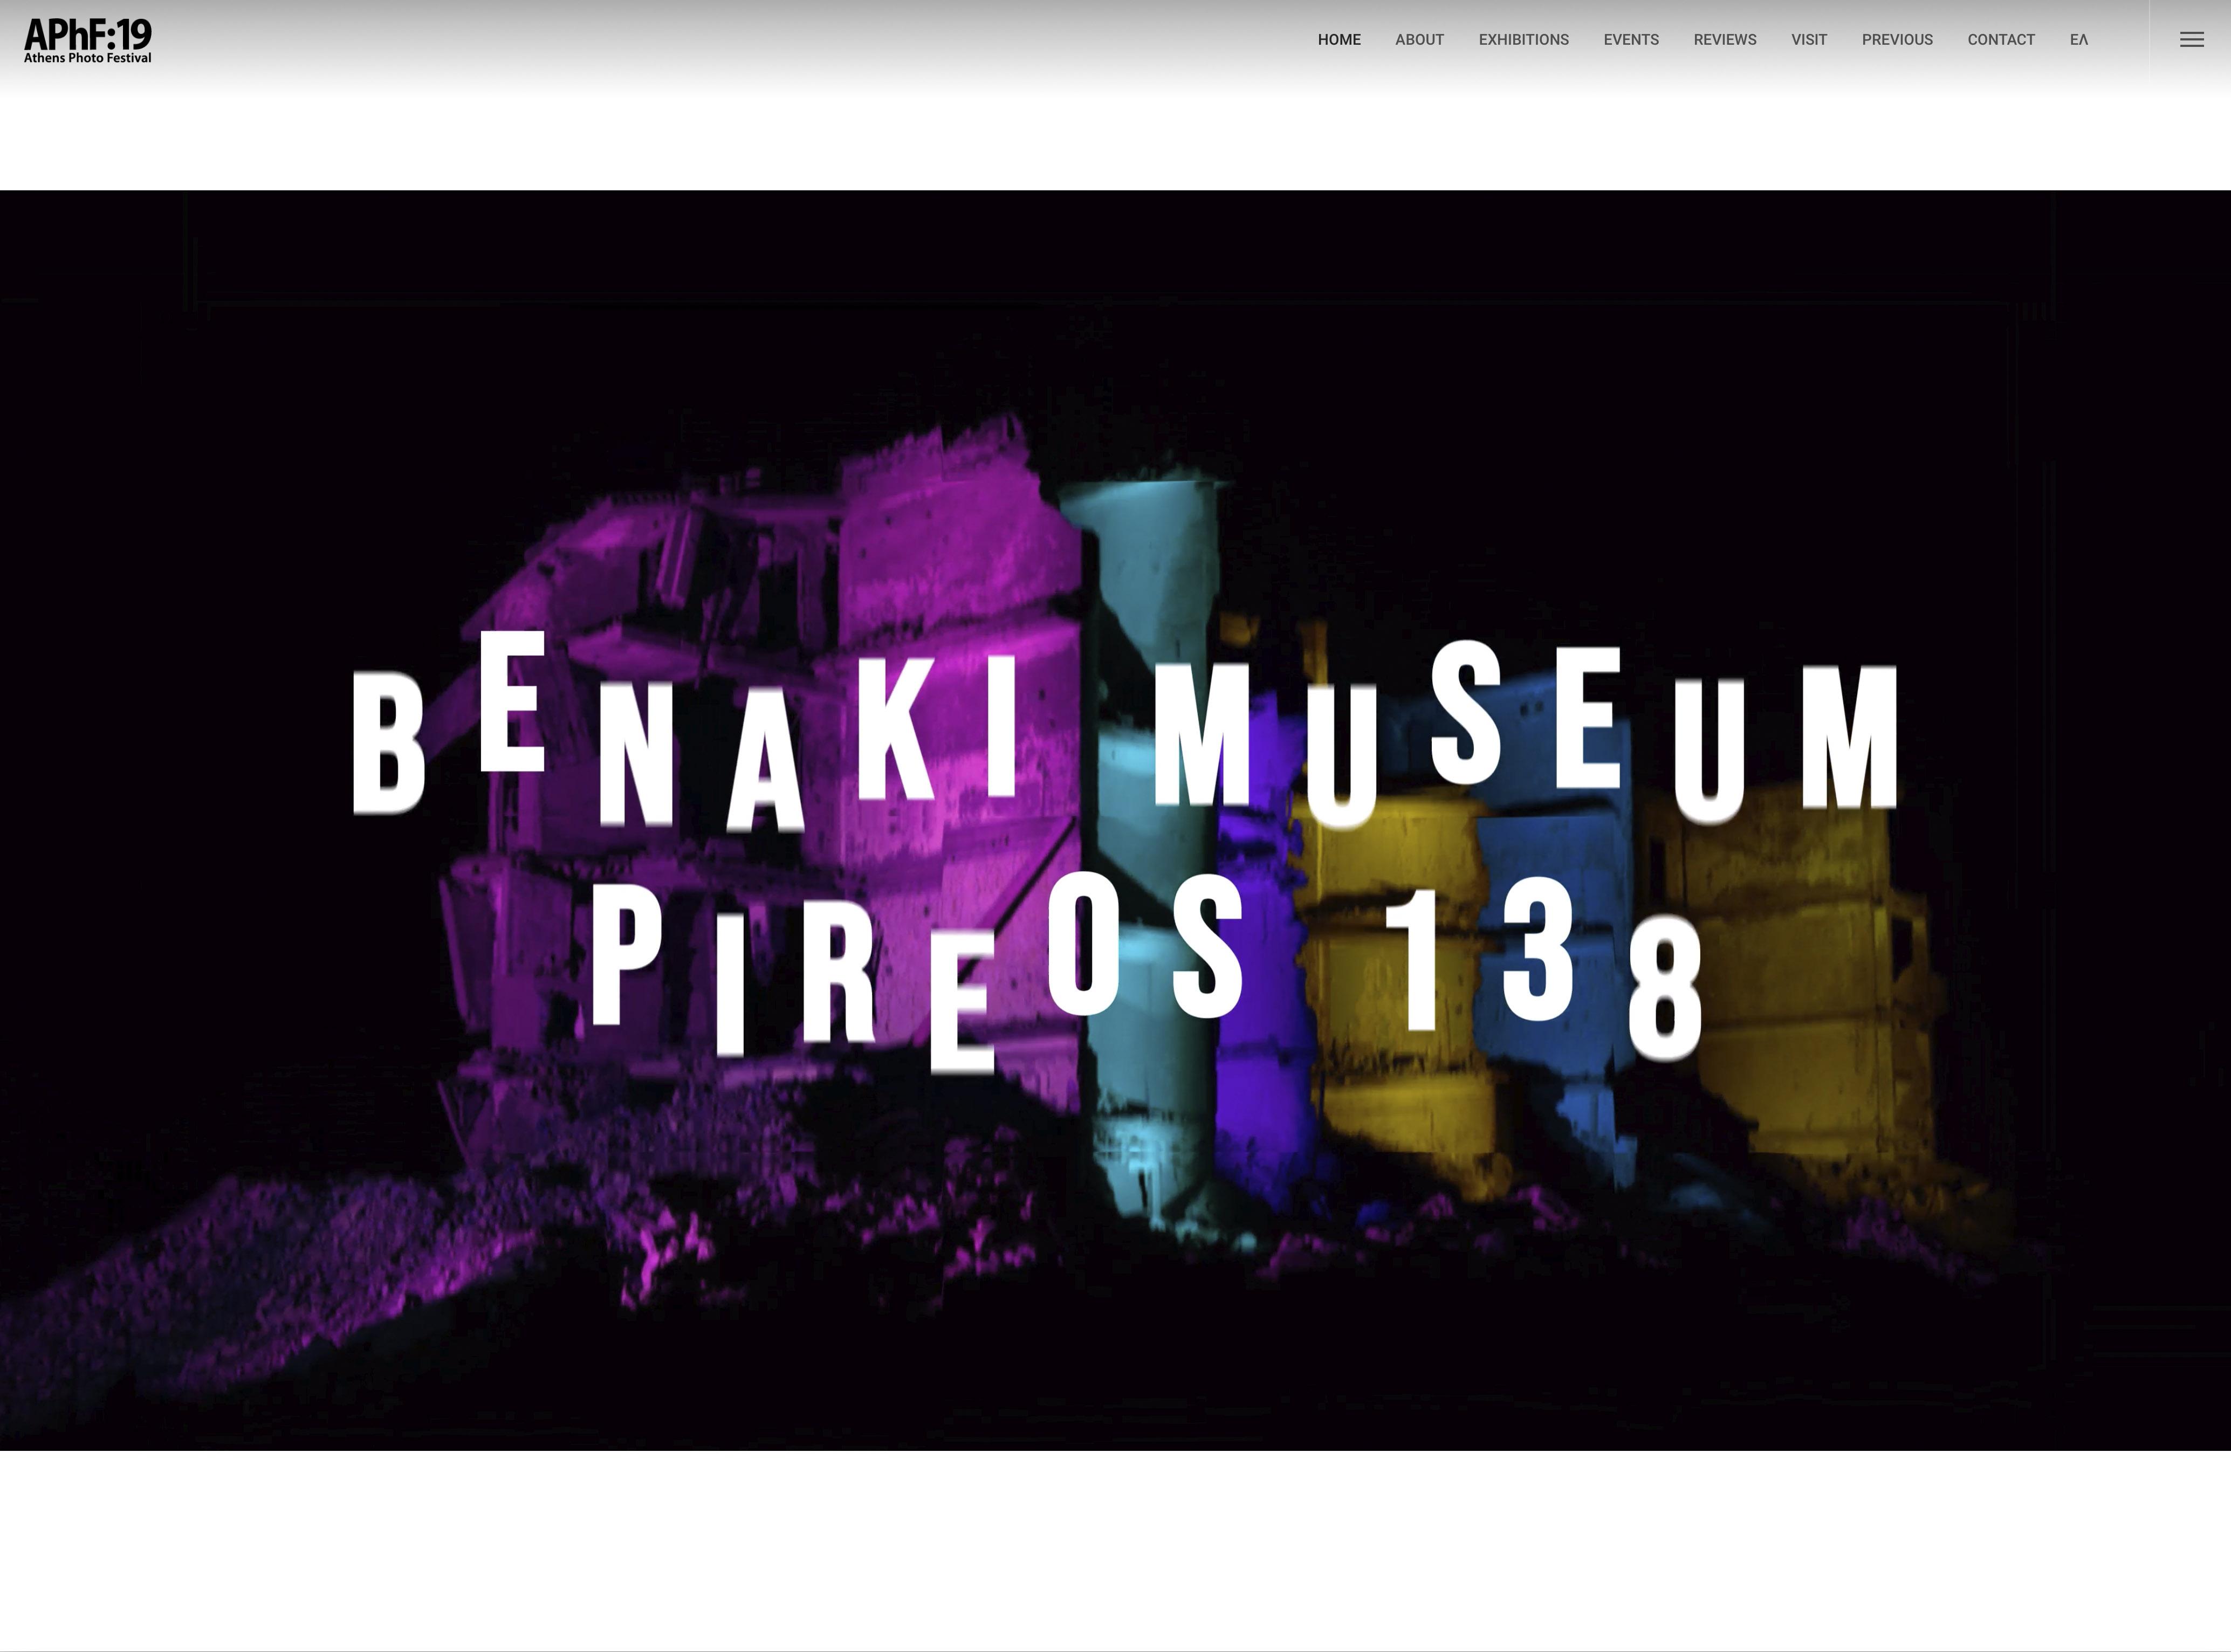 Athens Photo Festival 2019 website